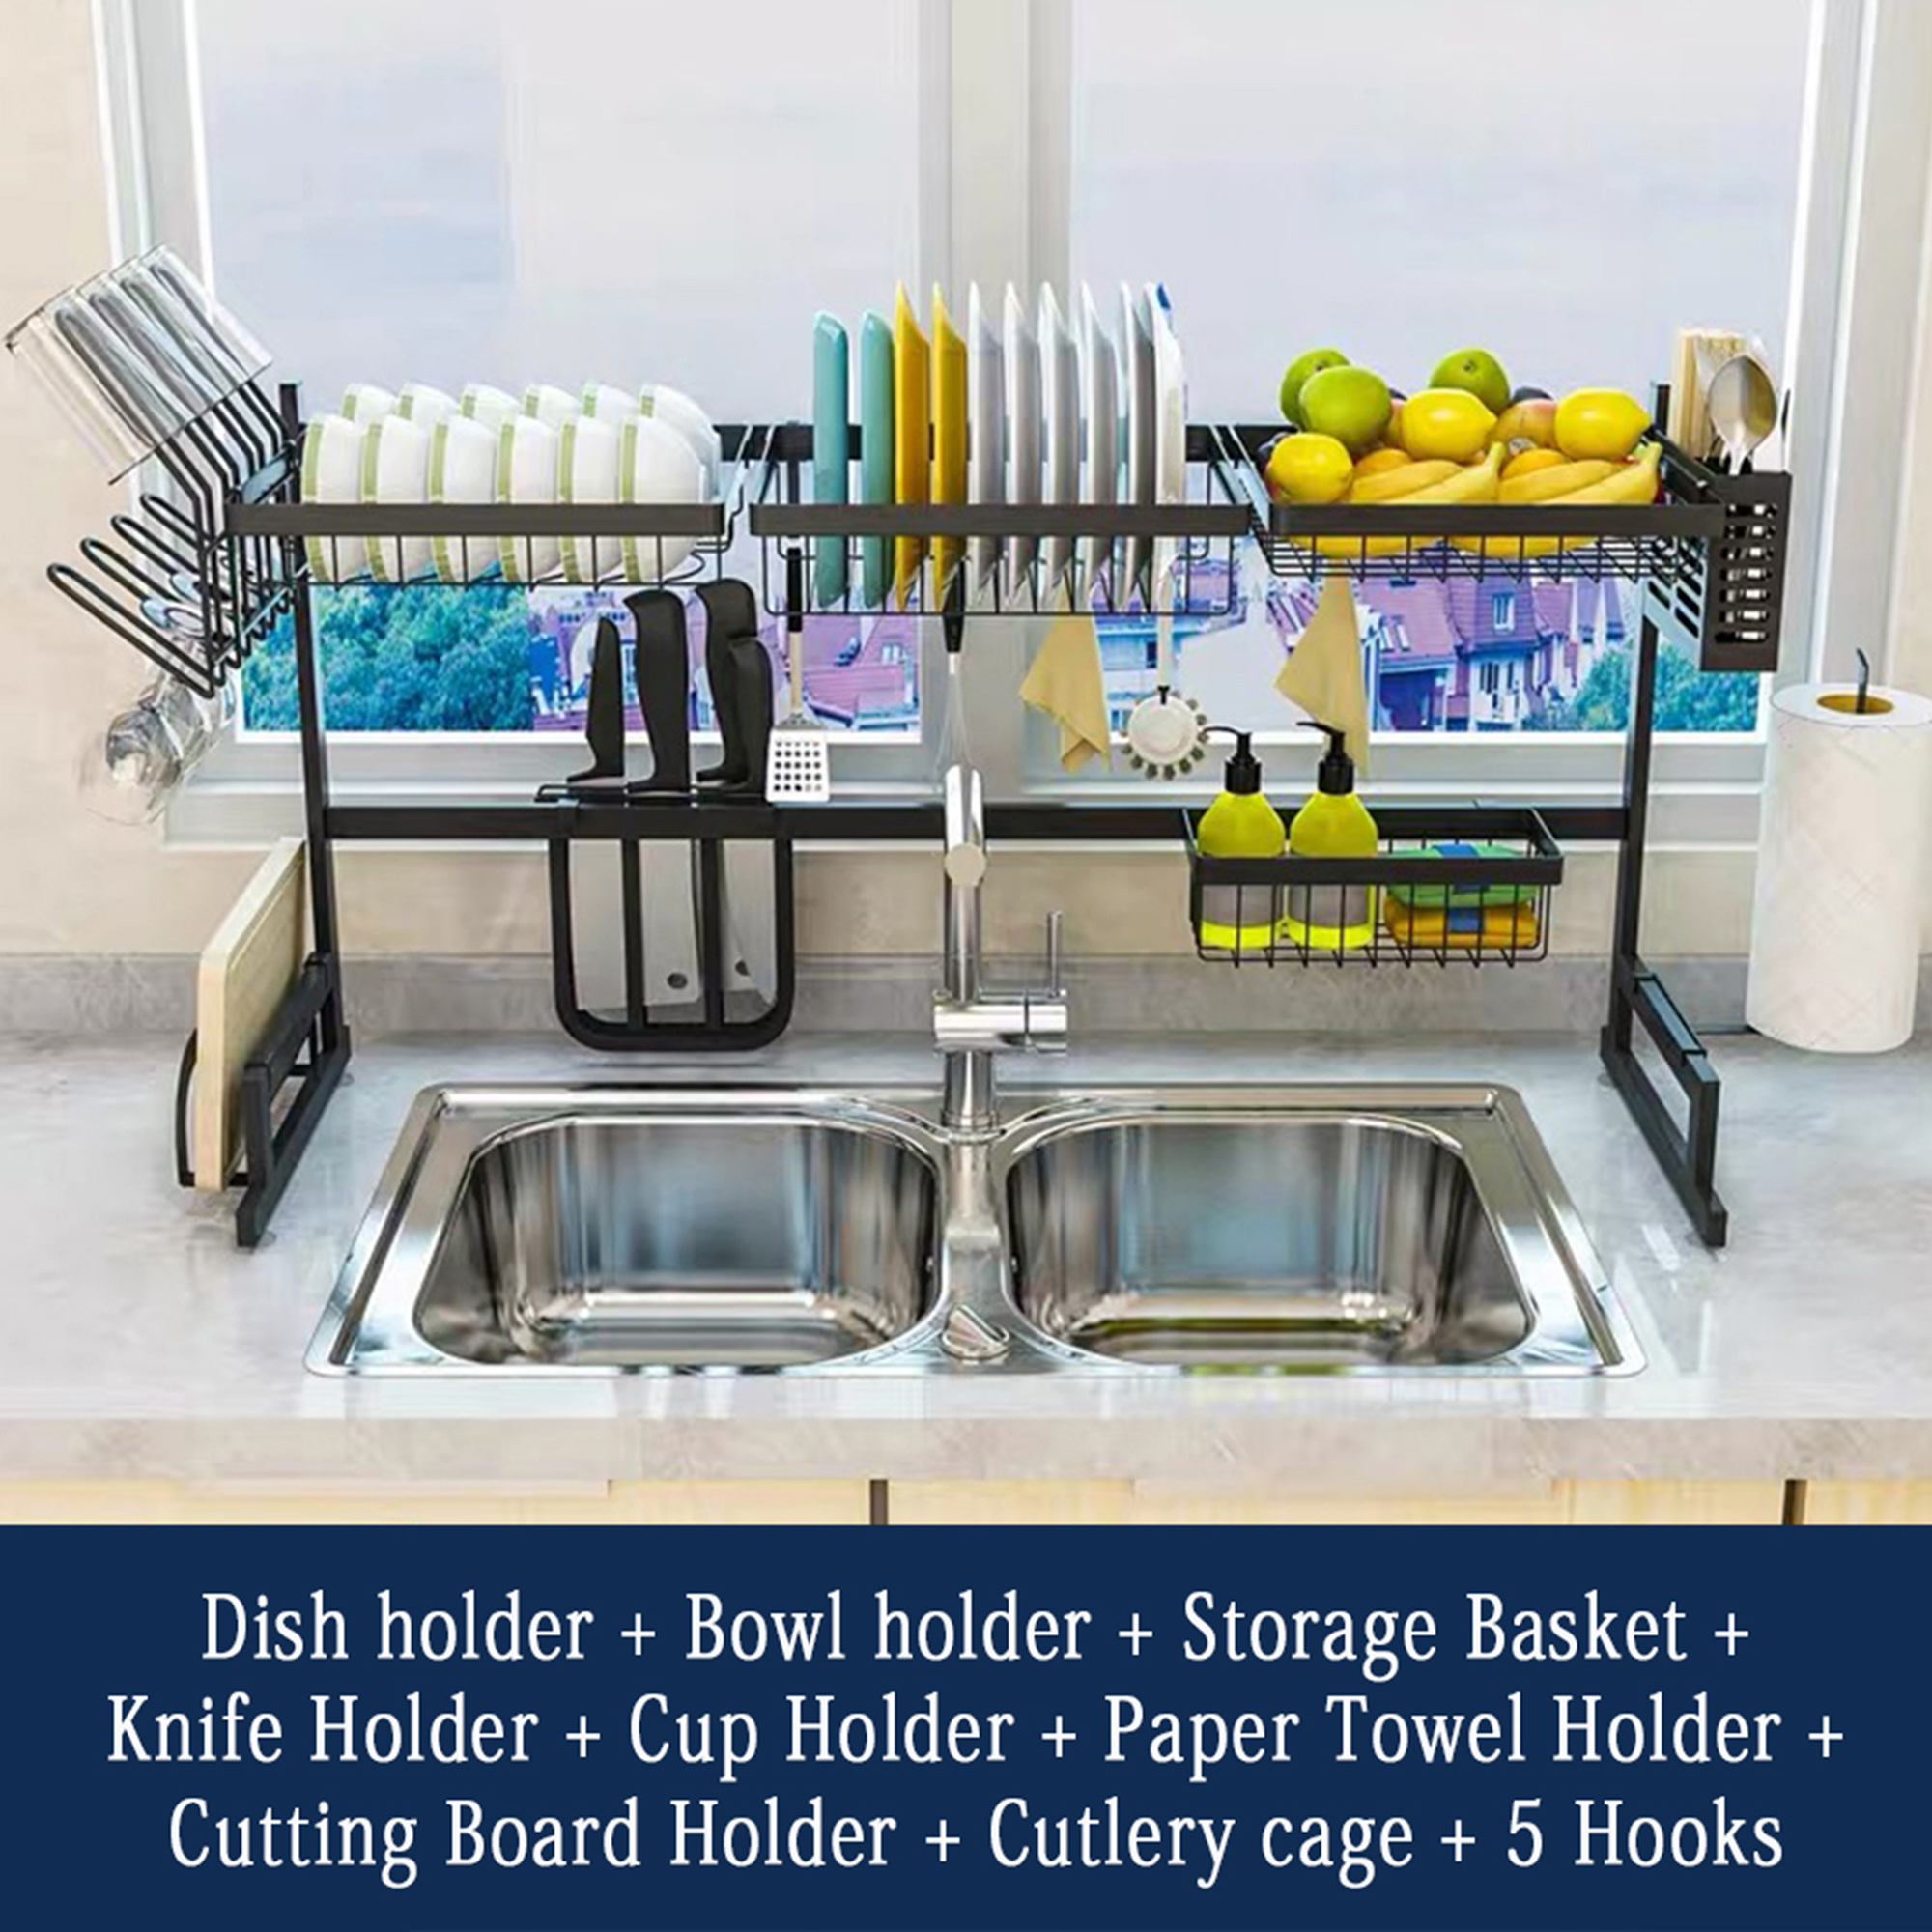 nk 26 34 2 dish drying rack over sink drainer shelf for kitchen drying rack organizer supplies storage counter kitchen space saver utensils